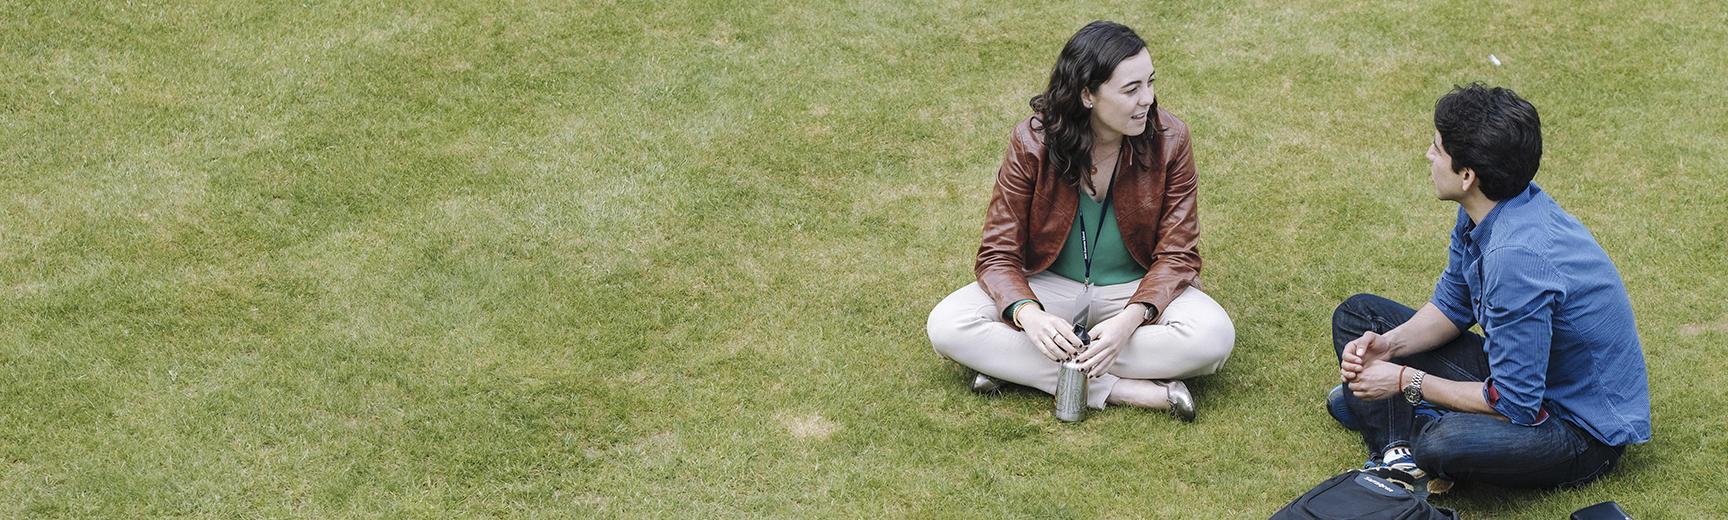 Macarena Hernandez de Obseo and Alexander Wankel having a conversation sat on the grass